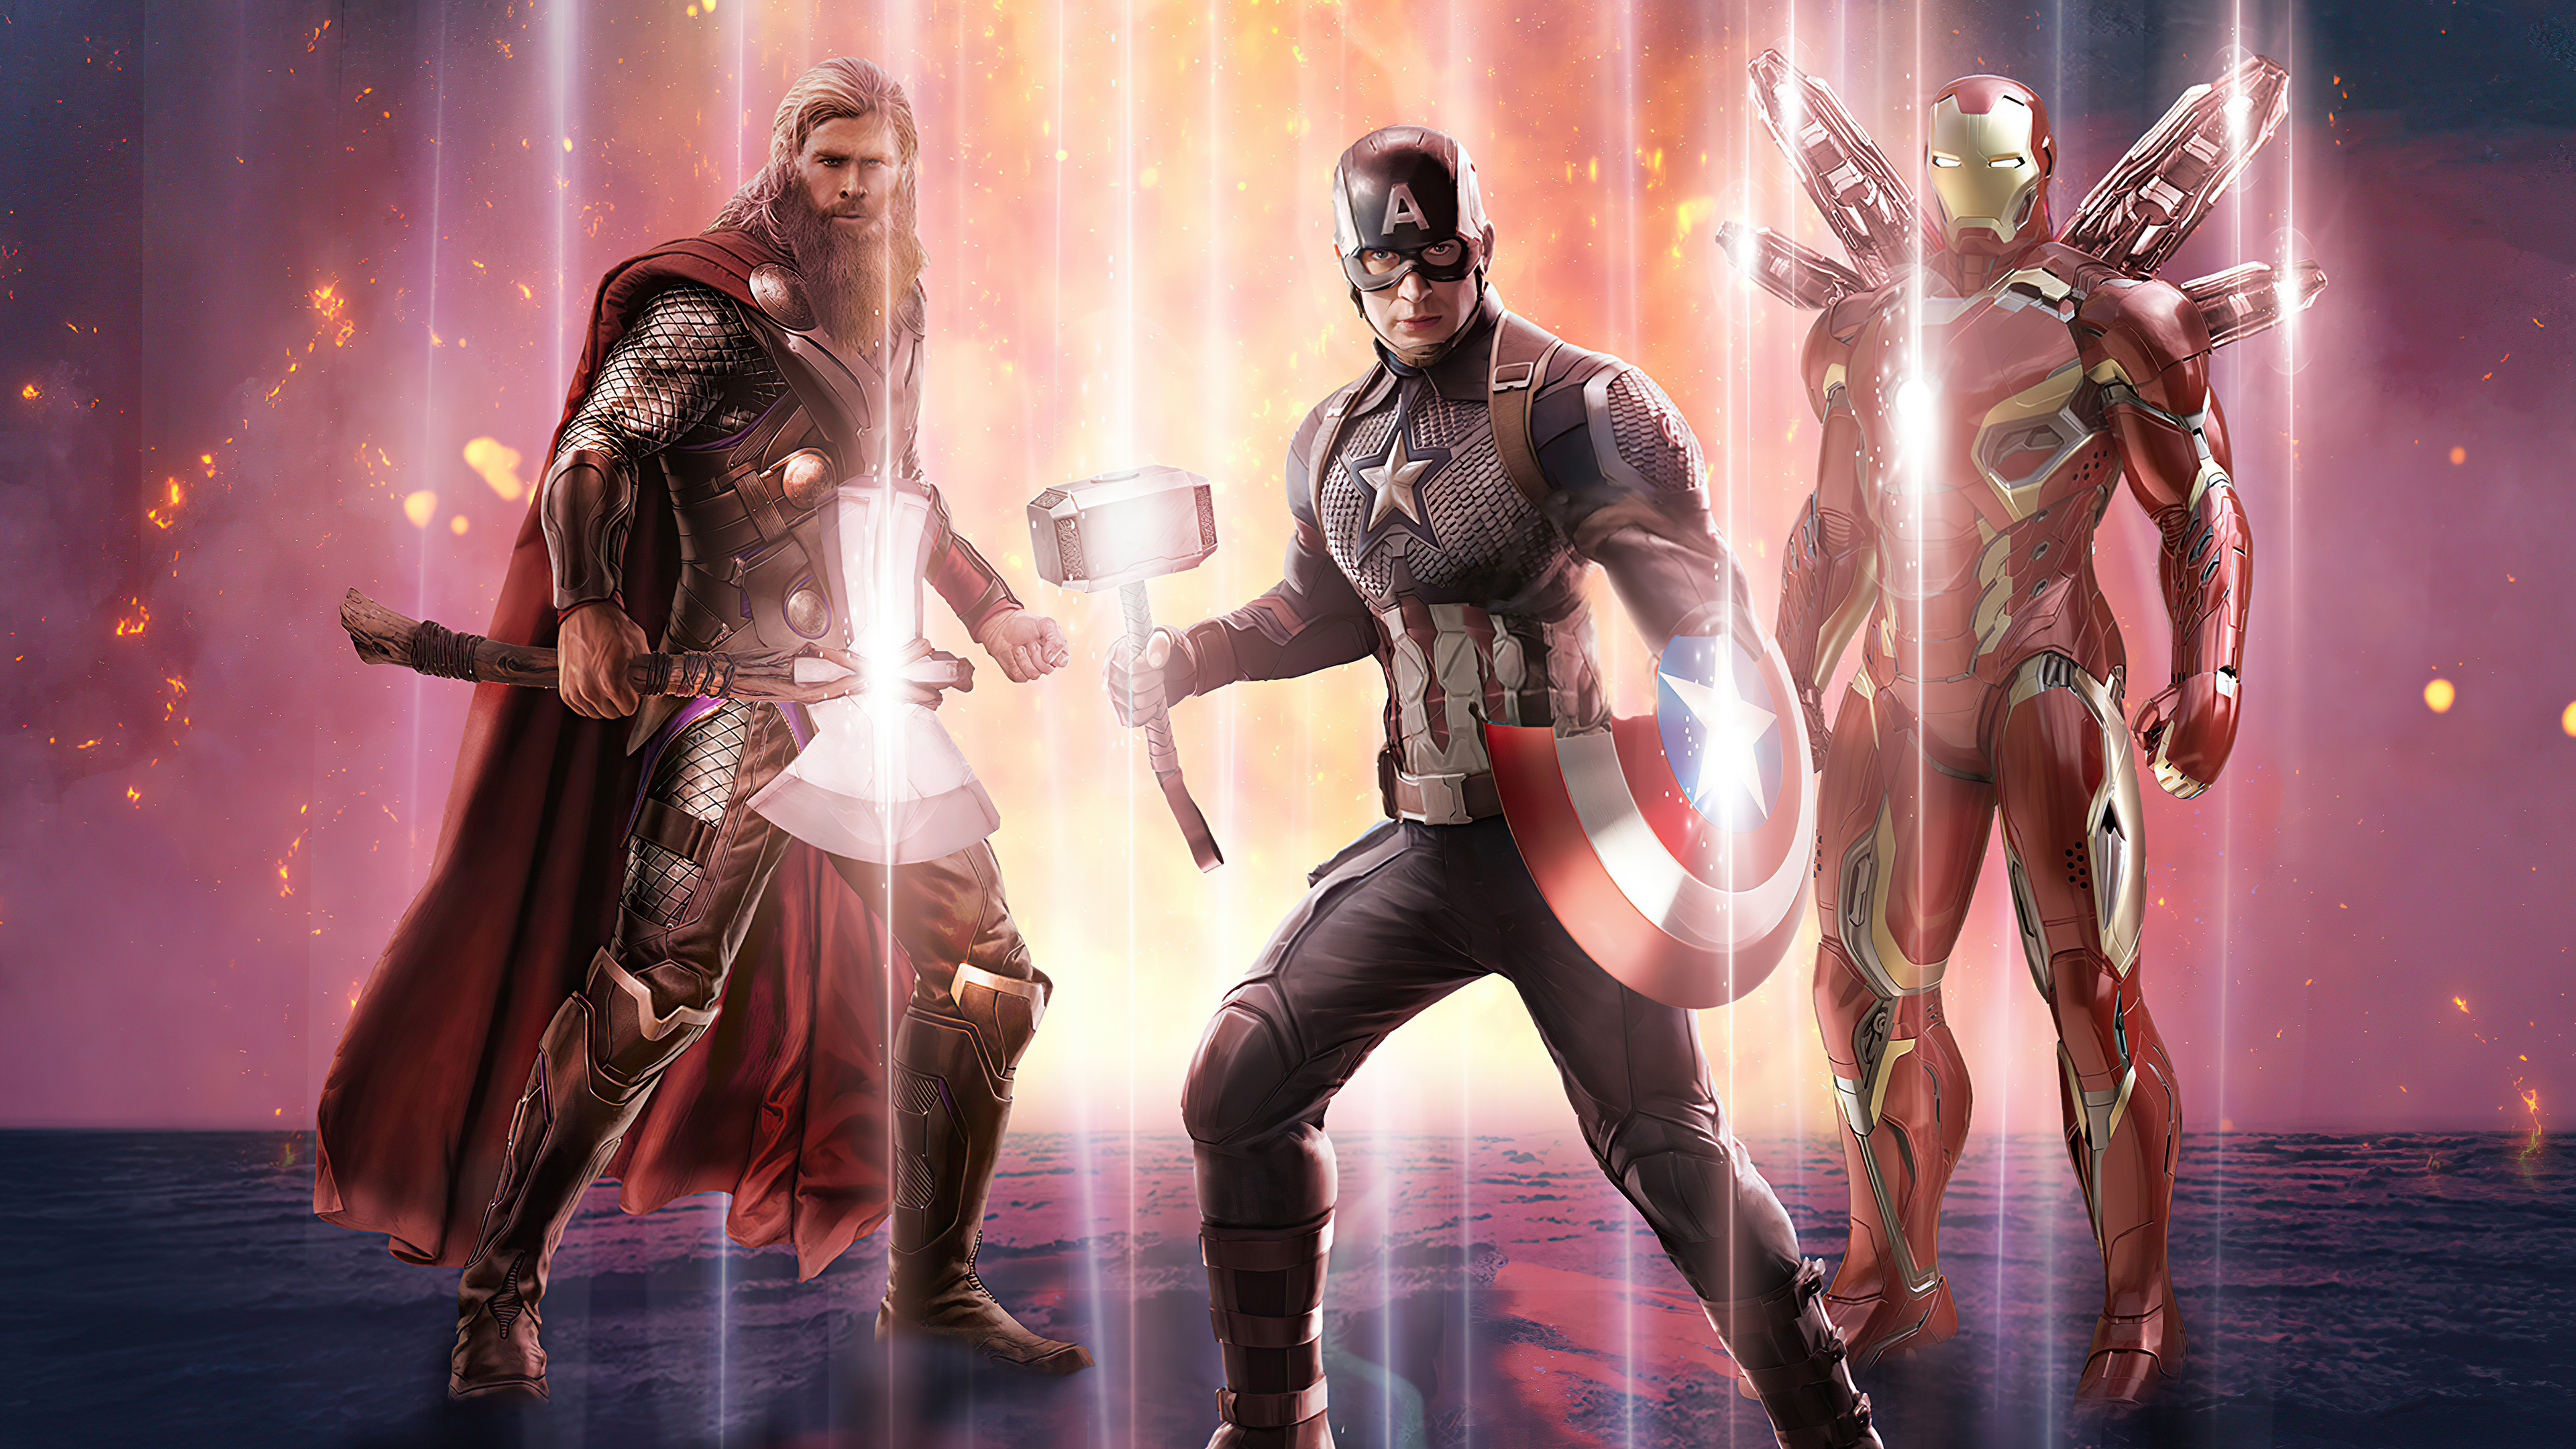 captain america thor iron man avengers end game 4k 1619215238 - Captain America Thor Iron Man Avengers End Game 4k - Captain America Thor Iron Man Avengers End Game 4k wallpapers